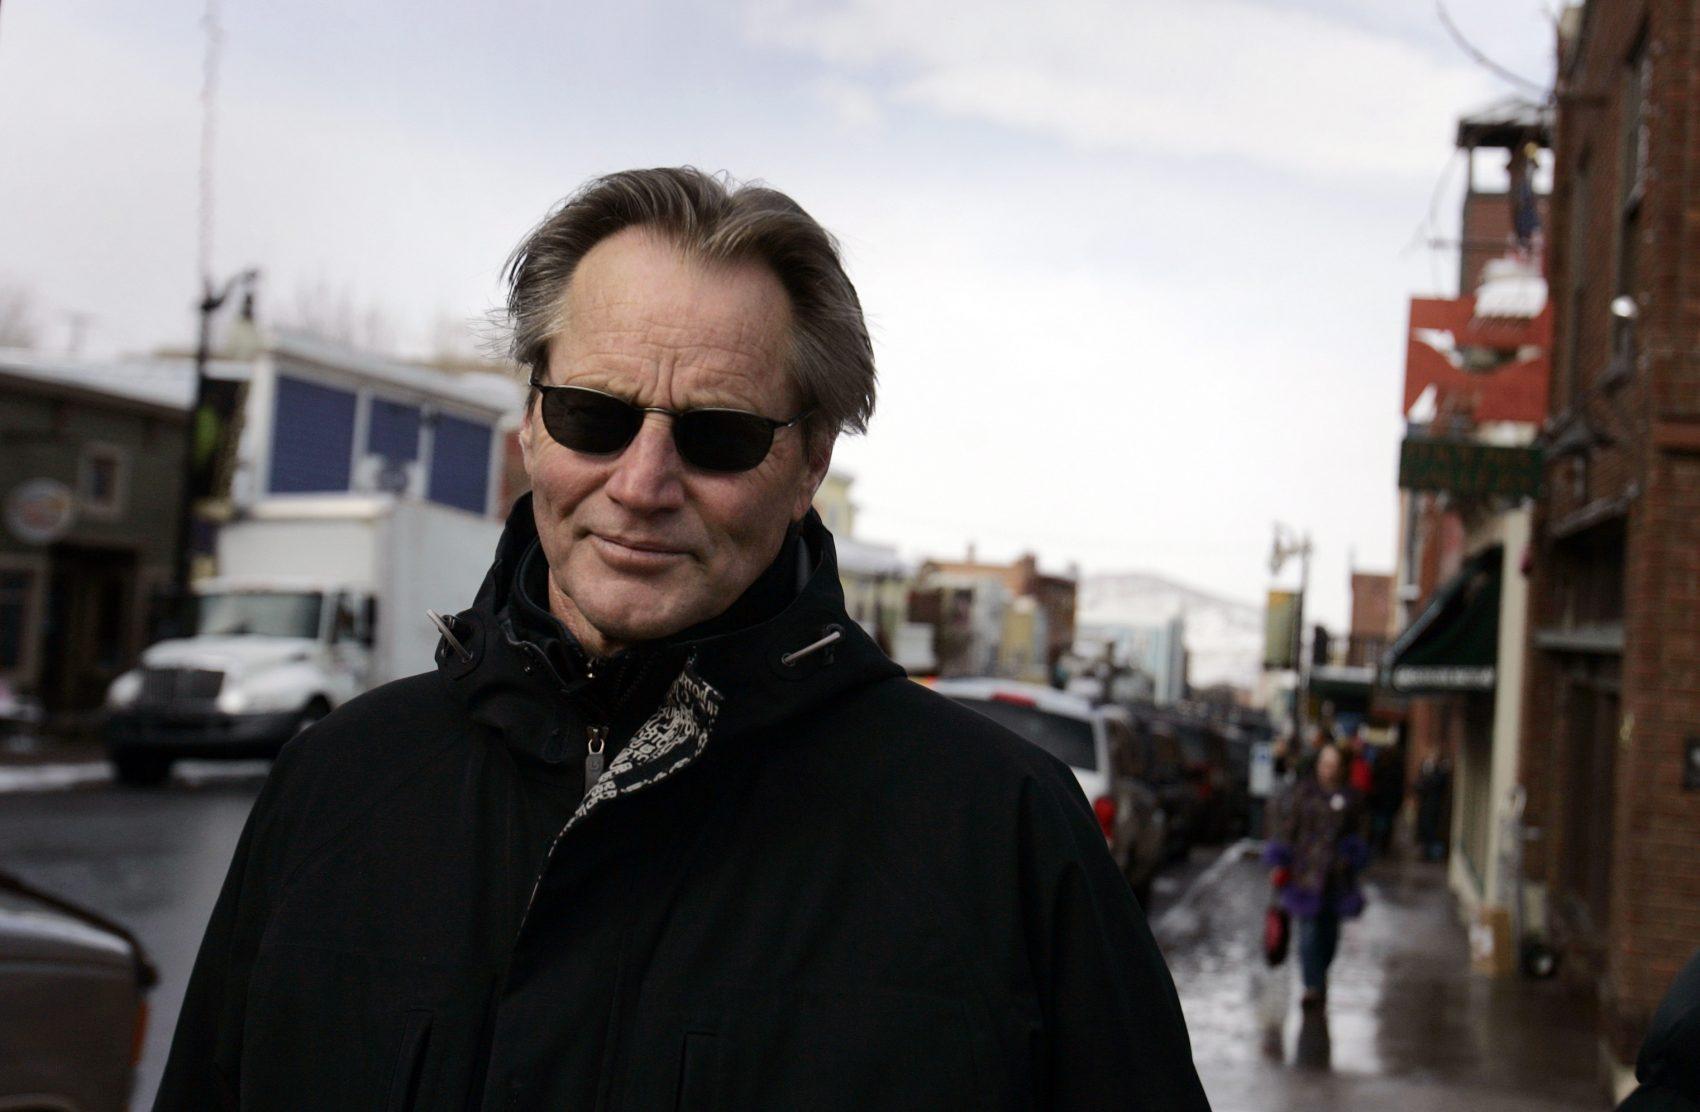 Sam Shepard on Main Street in Park City, Utah, during the Sundance Film Festival in 2006. (Carolyn Kaster/AP)